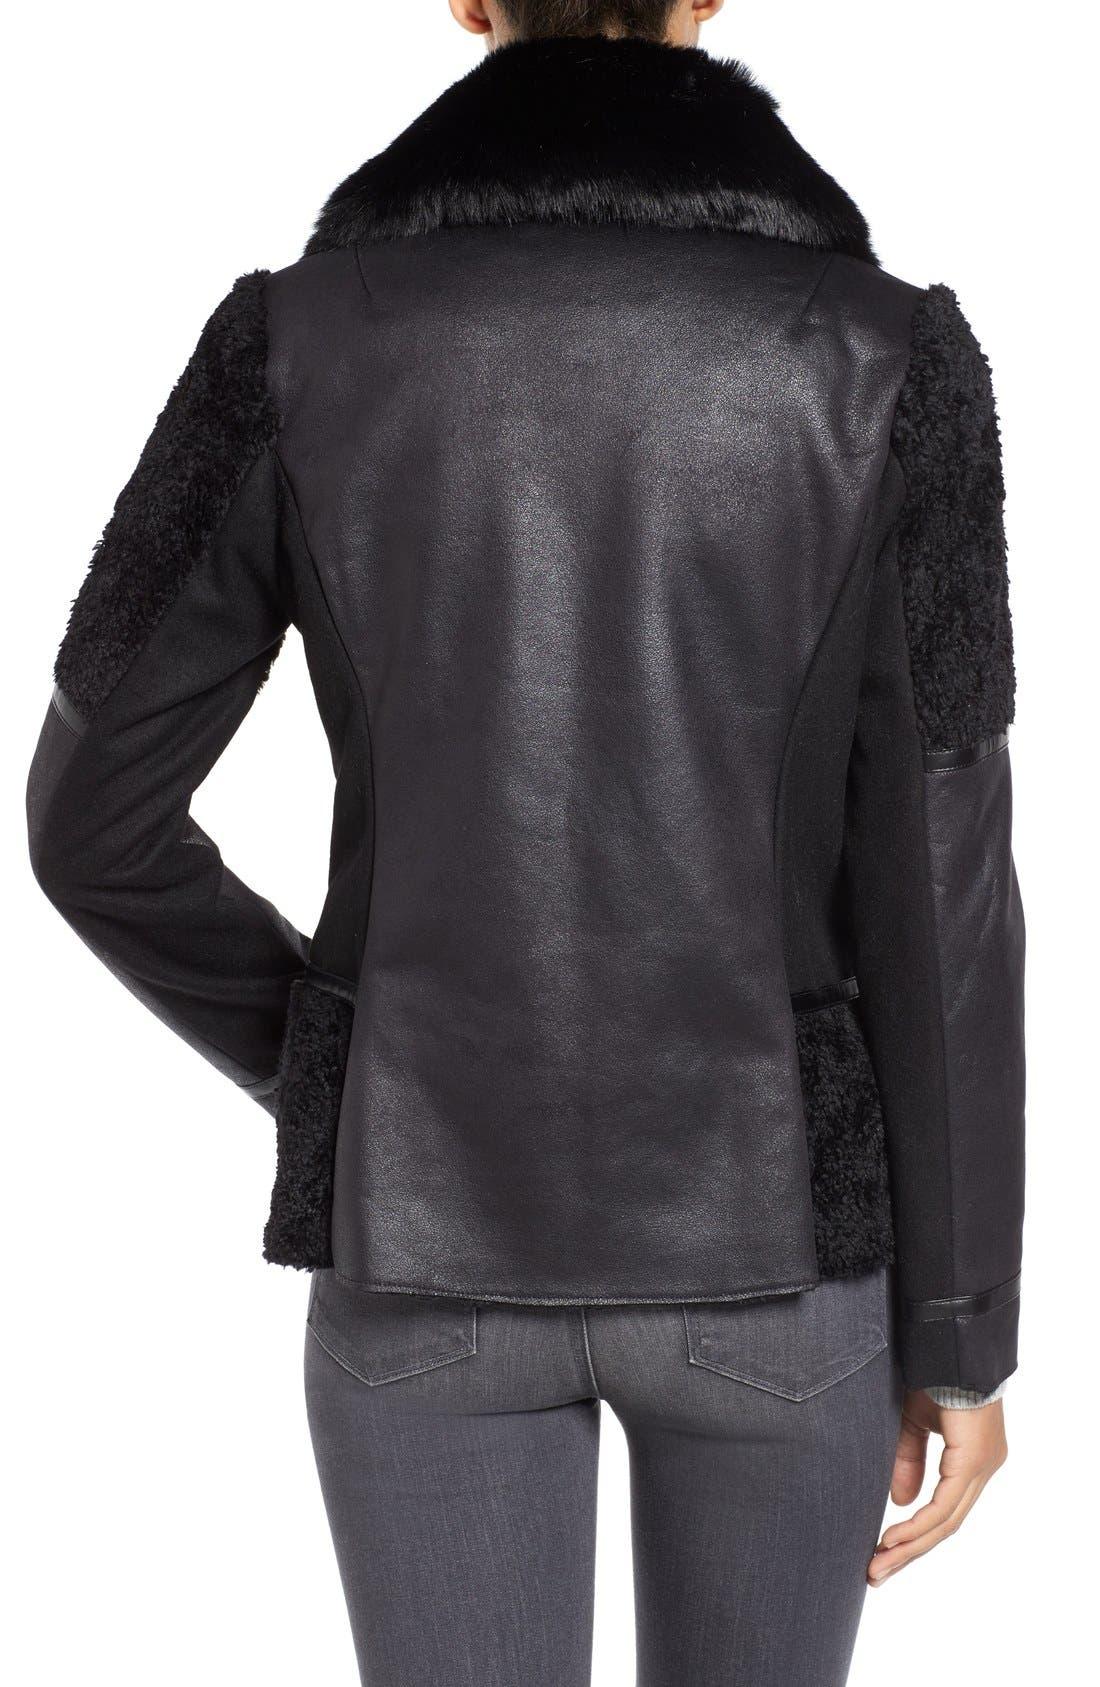 Alternate Image 2  - Vince Camuto Mixed Media Faux Shearling Moto Jacket